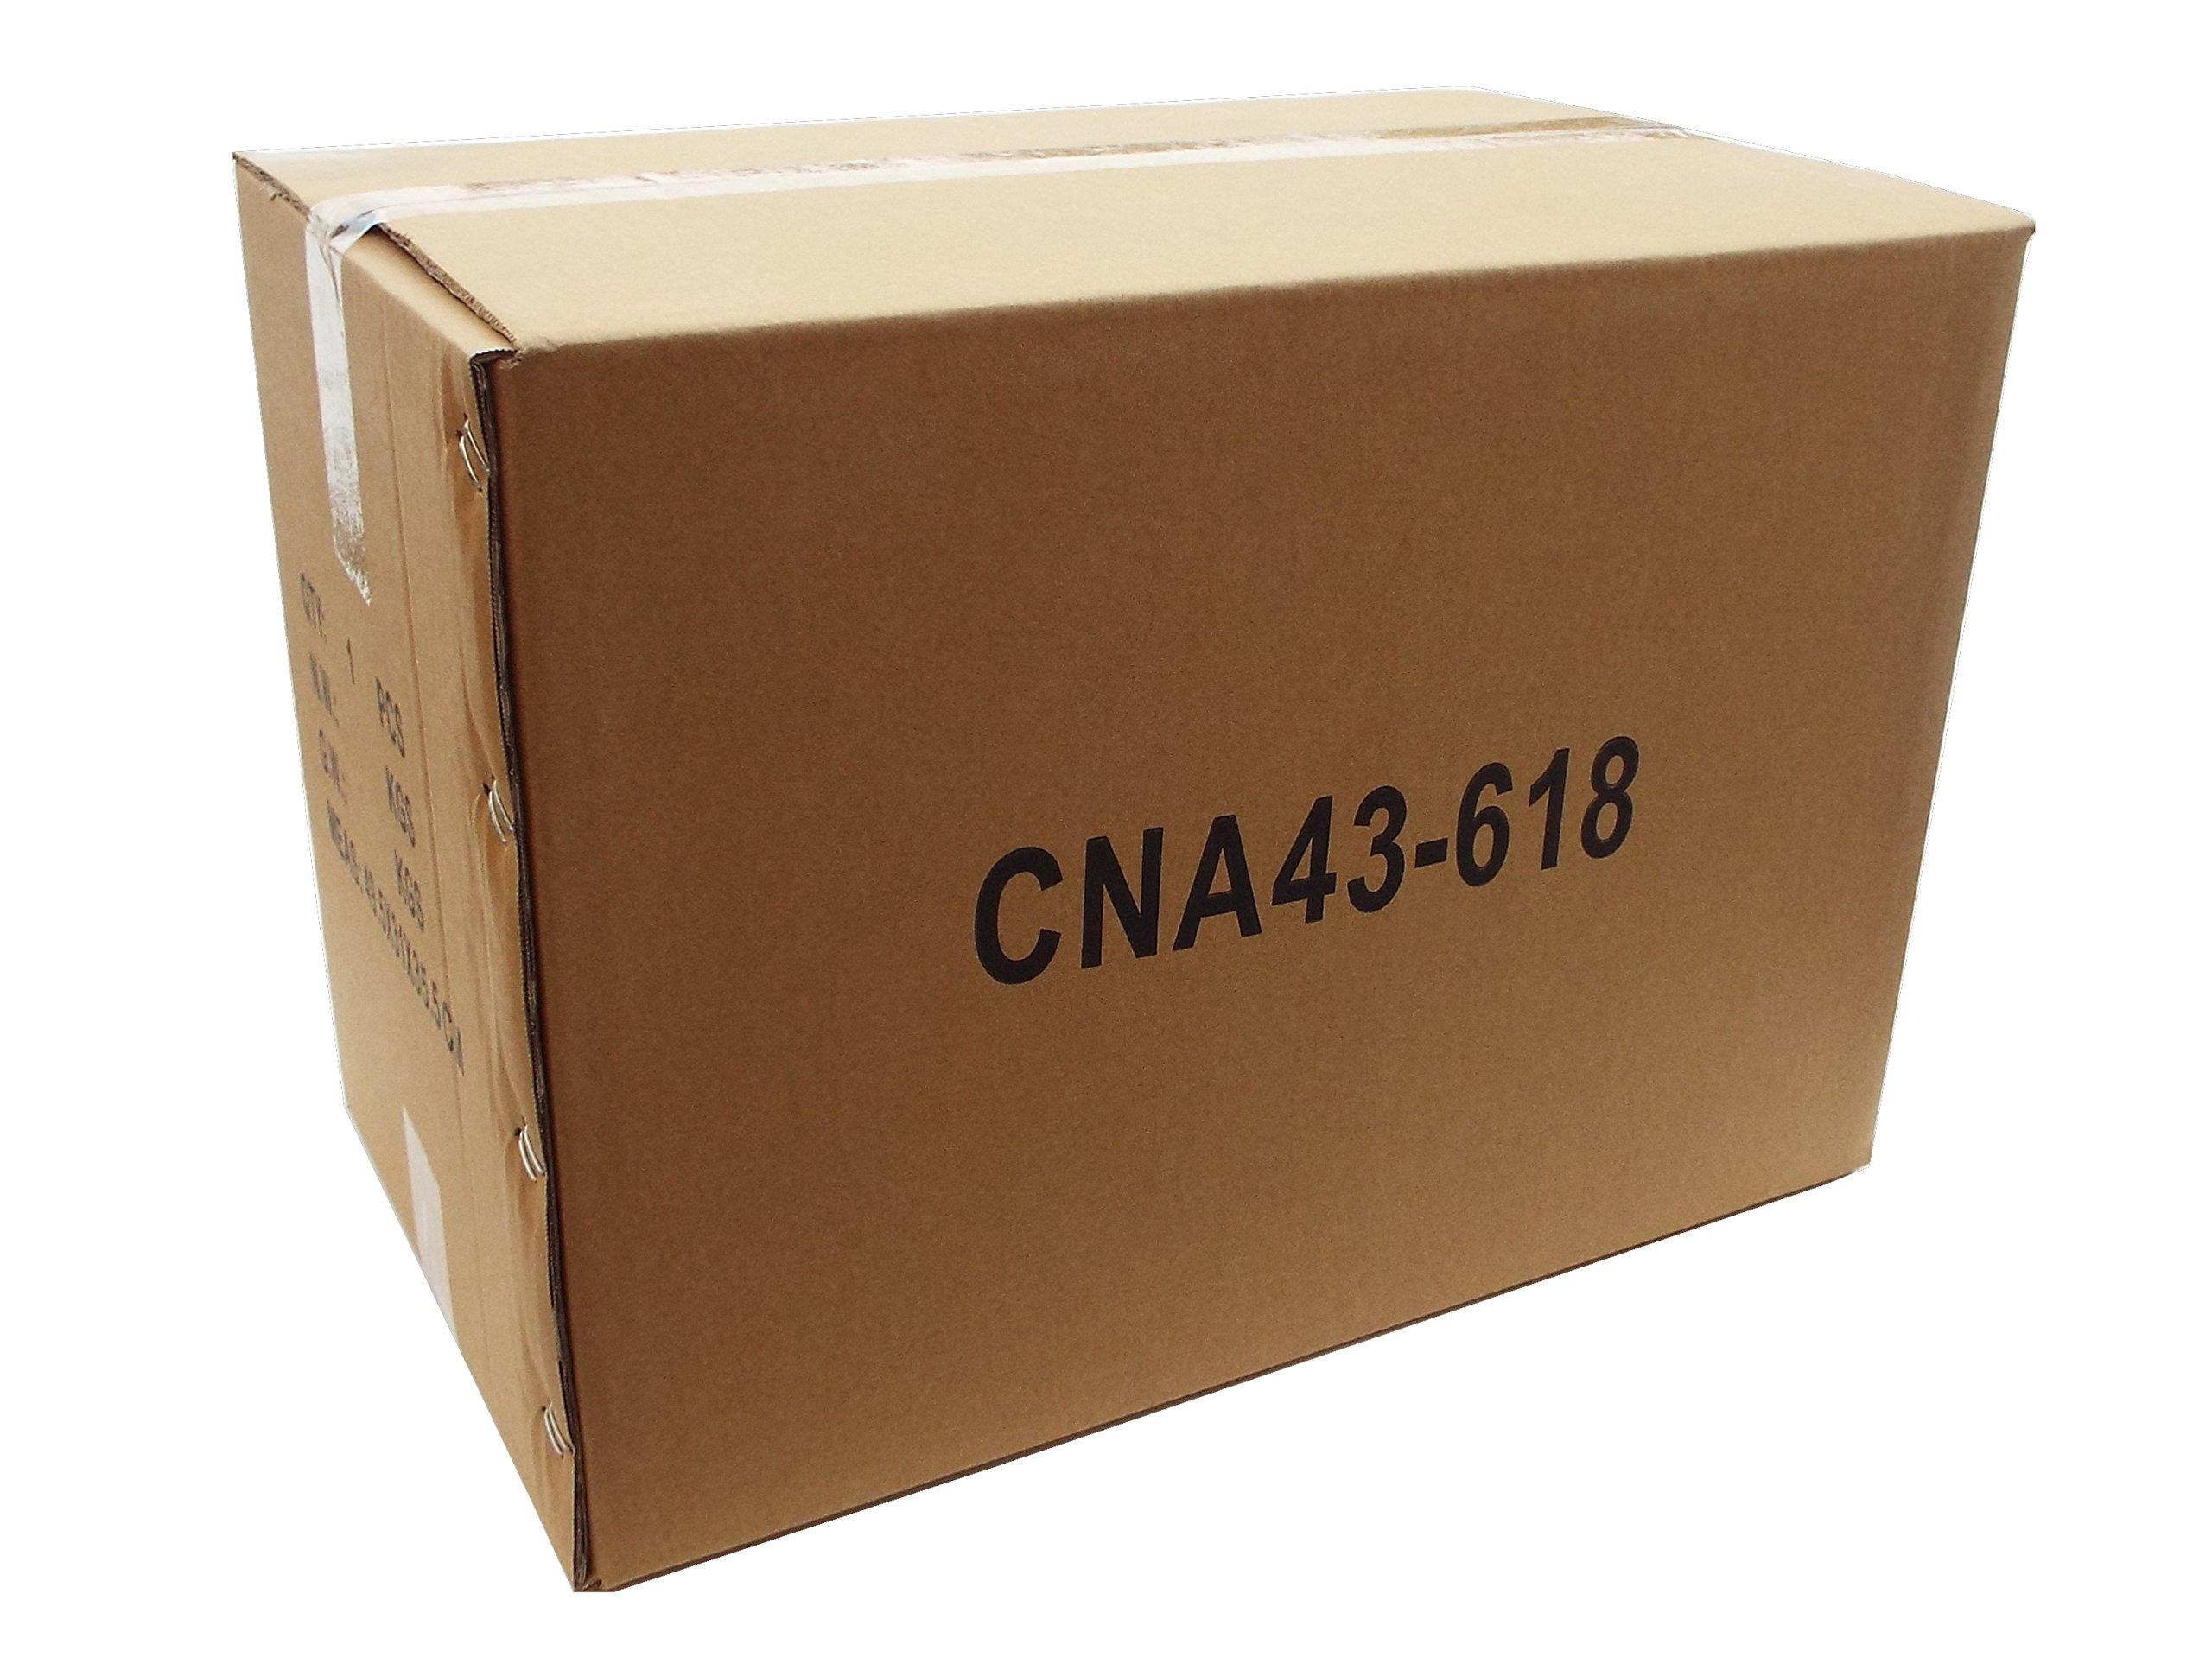 CNAweb 7U 19-Inch Hinged Network Wall Mount Equipment Rack Bracket - Black by CNAWEB